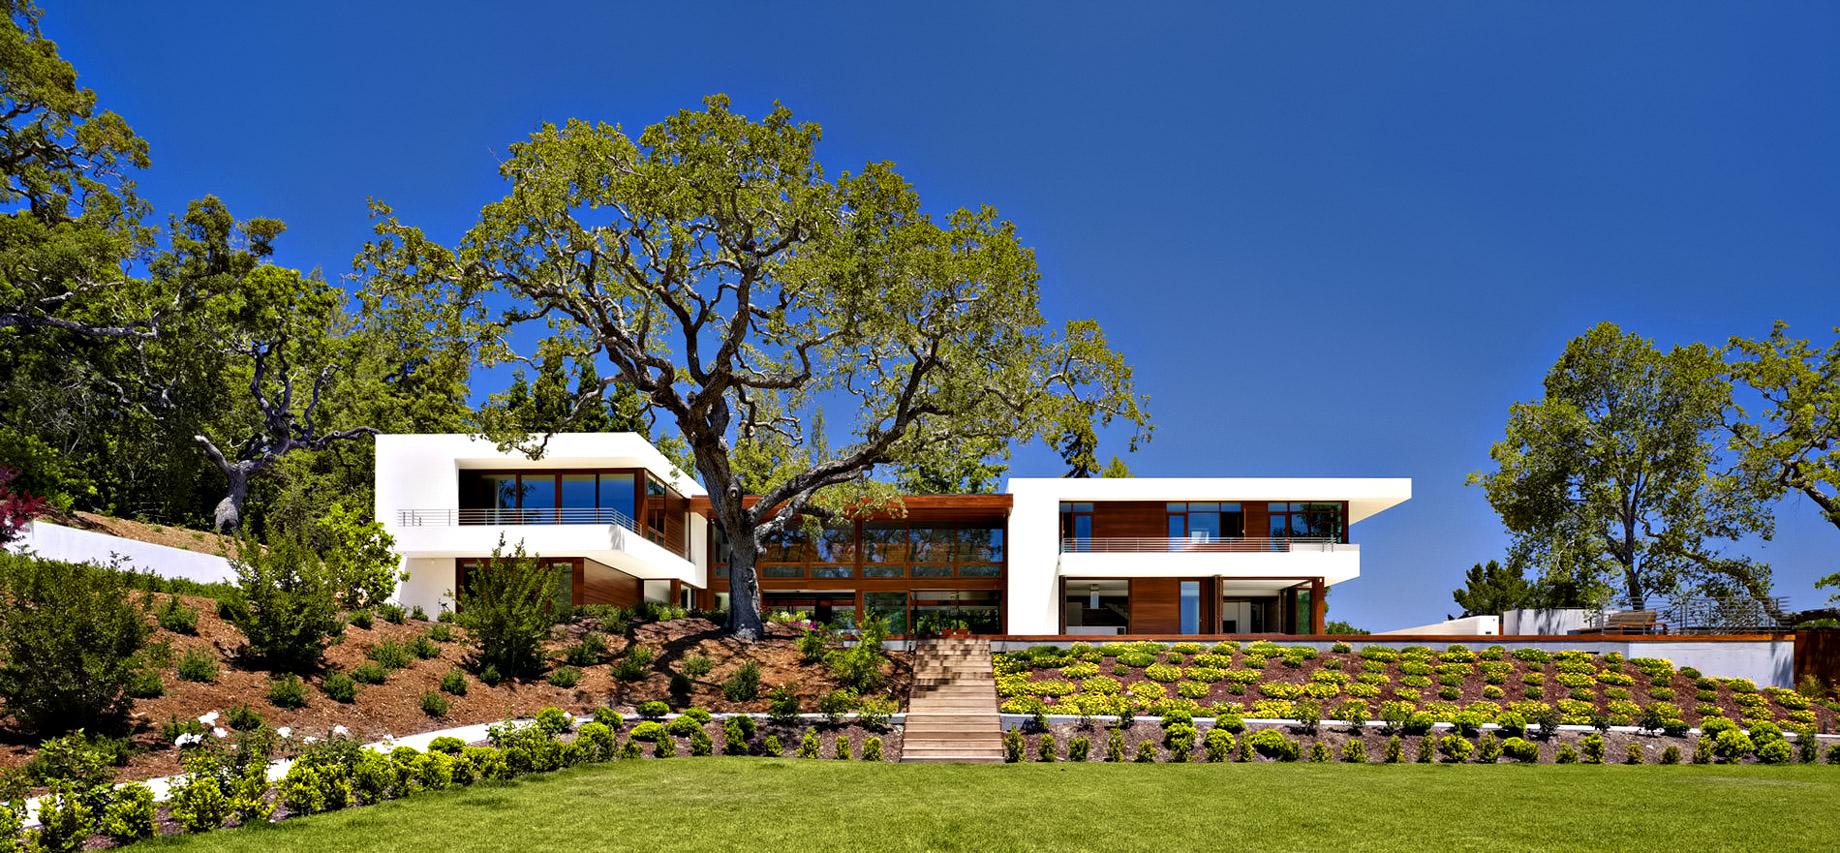 Modern Luxury OZ Residence - 92 Sutherland Drive, Atherton, CA, USA